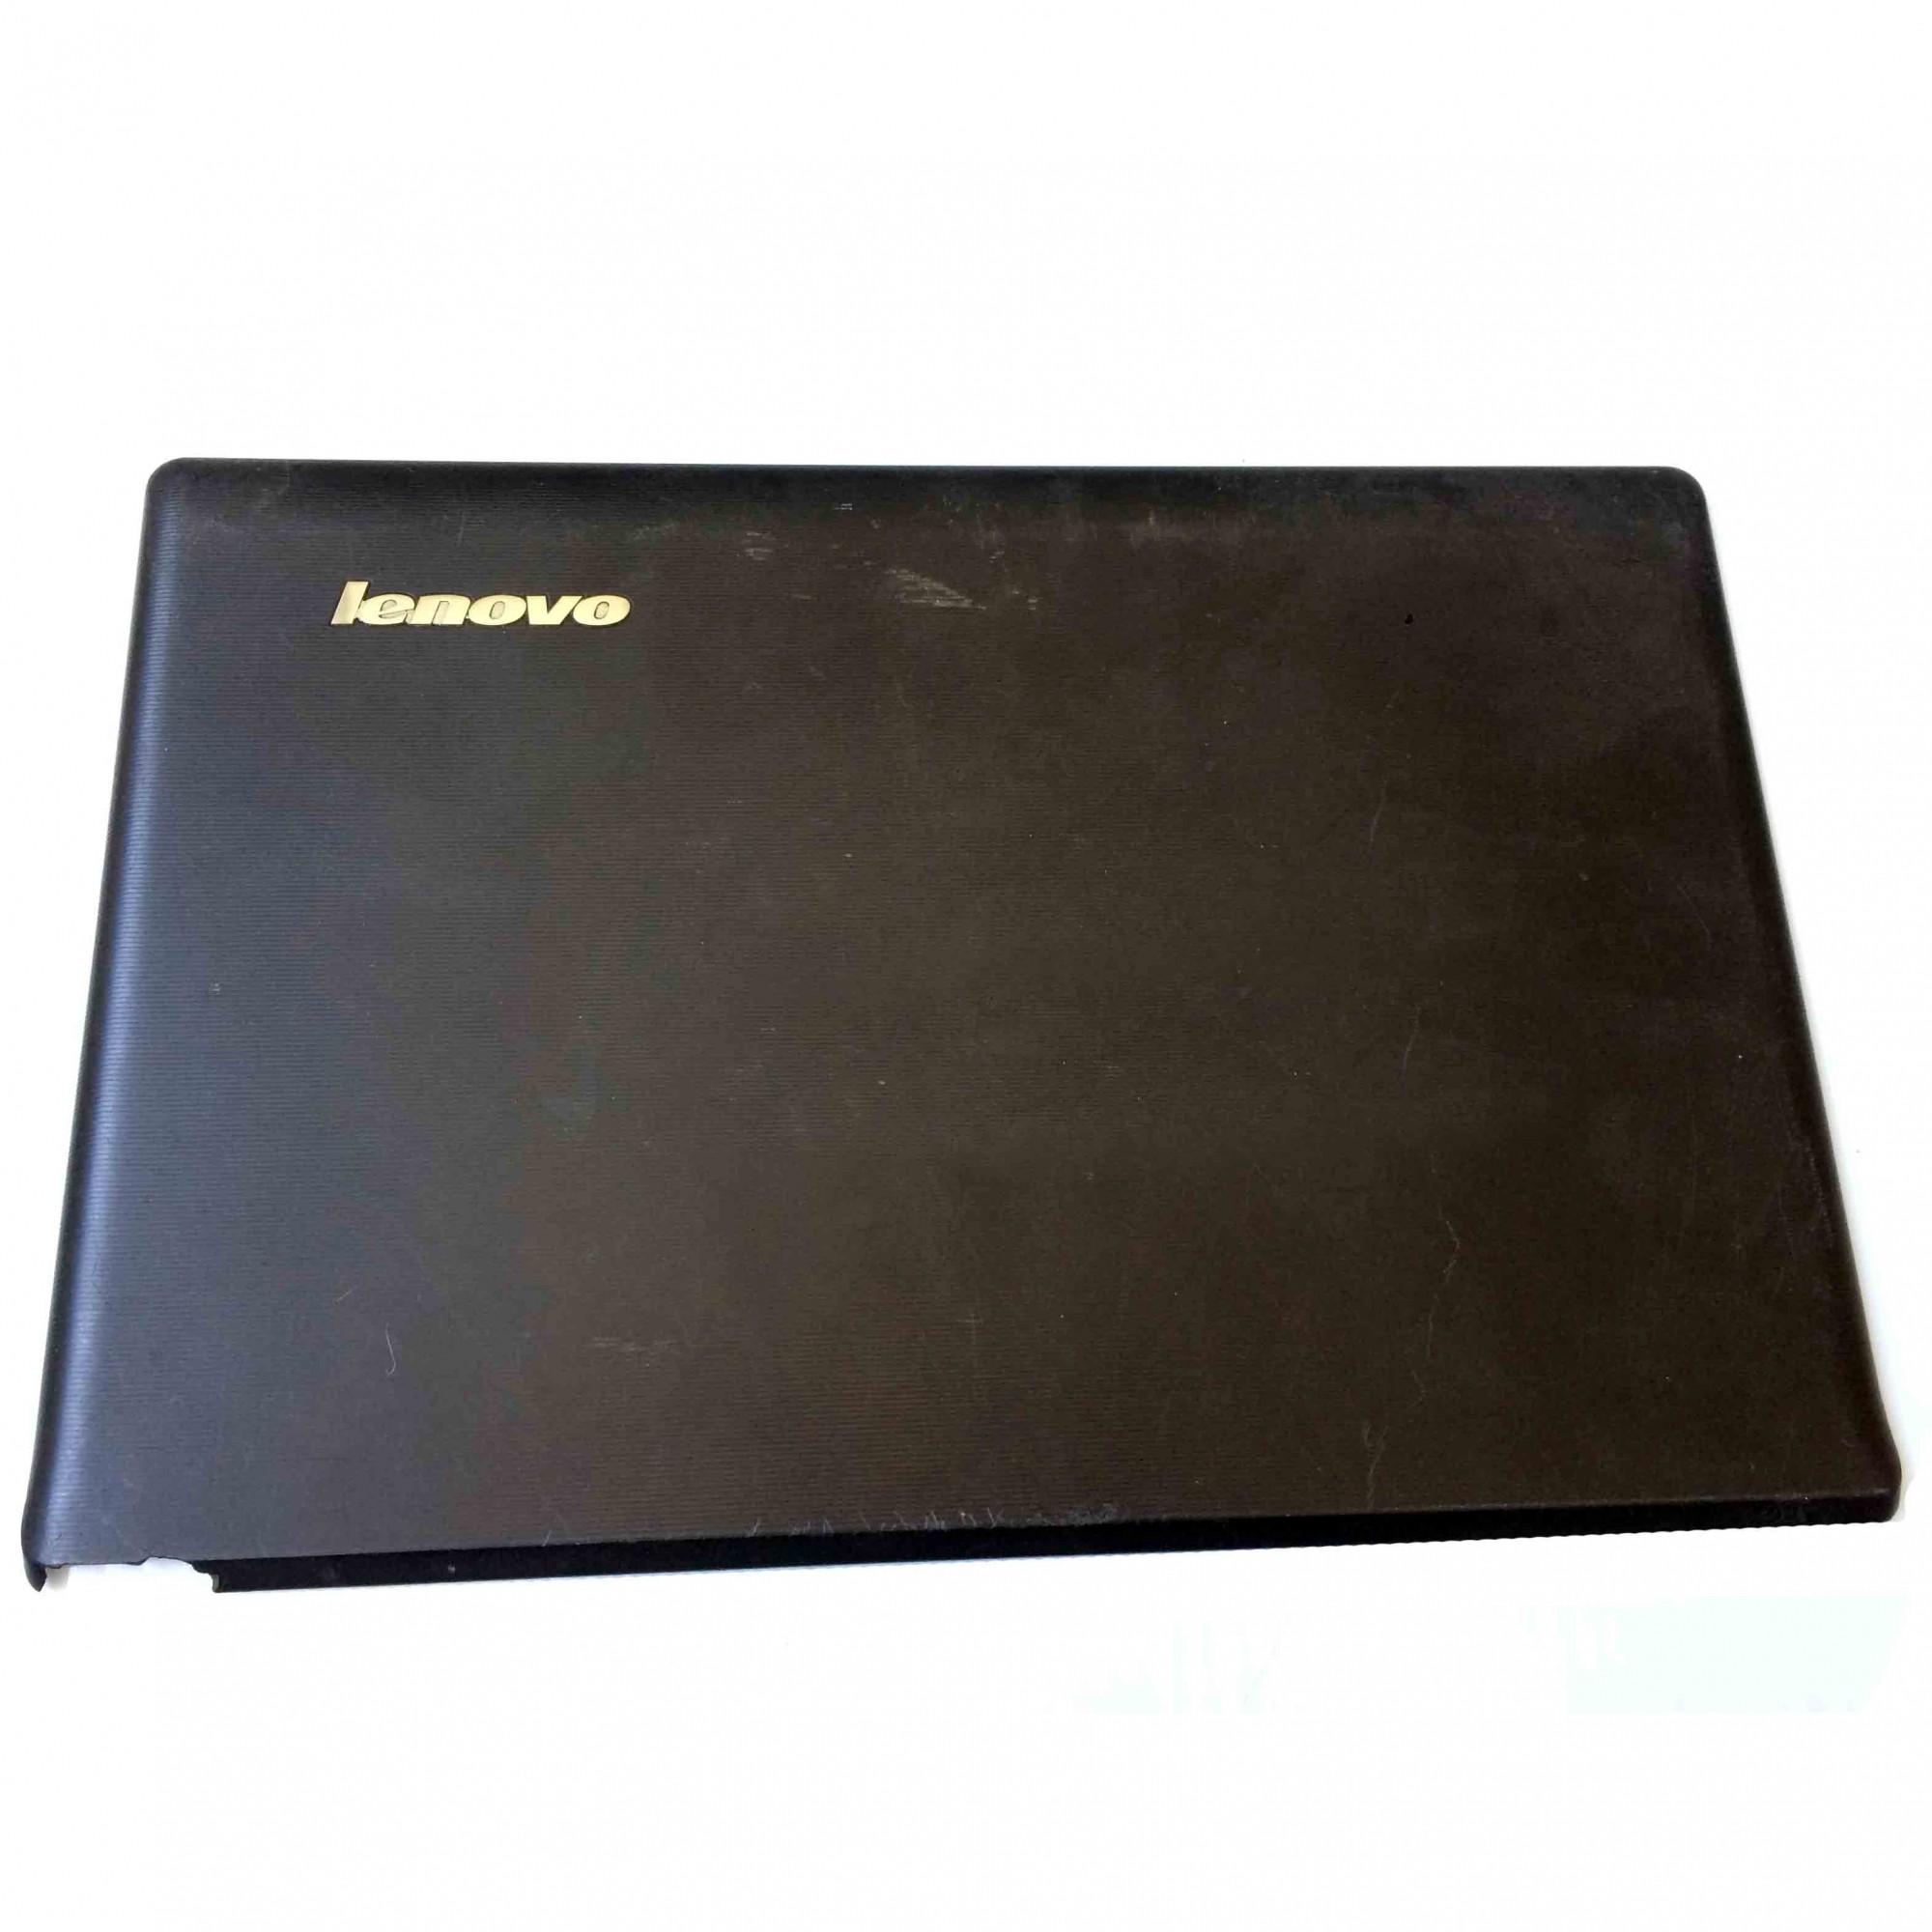 Carcaça Tampa LCD P/ Notebook Lenovo IdeaPad G470 G475 PN: AP0GL0005001 - Retirado